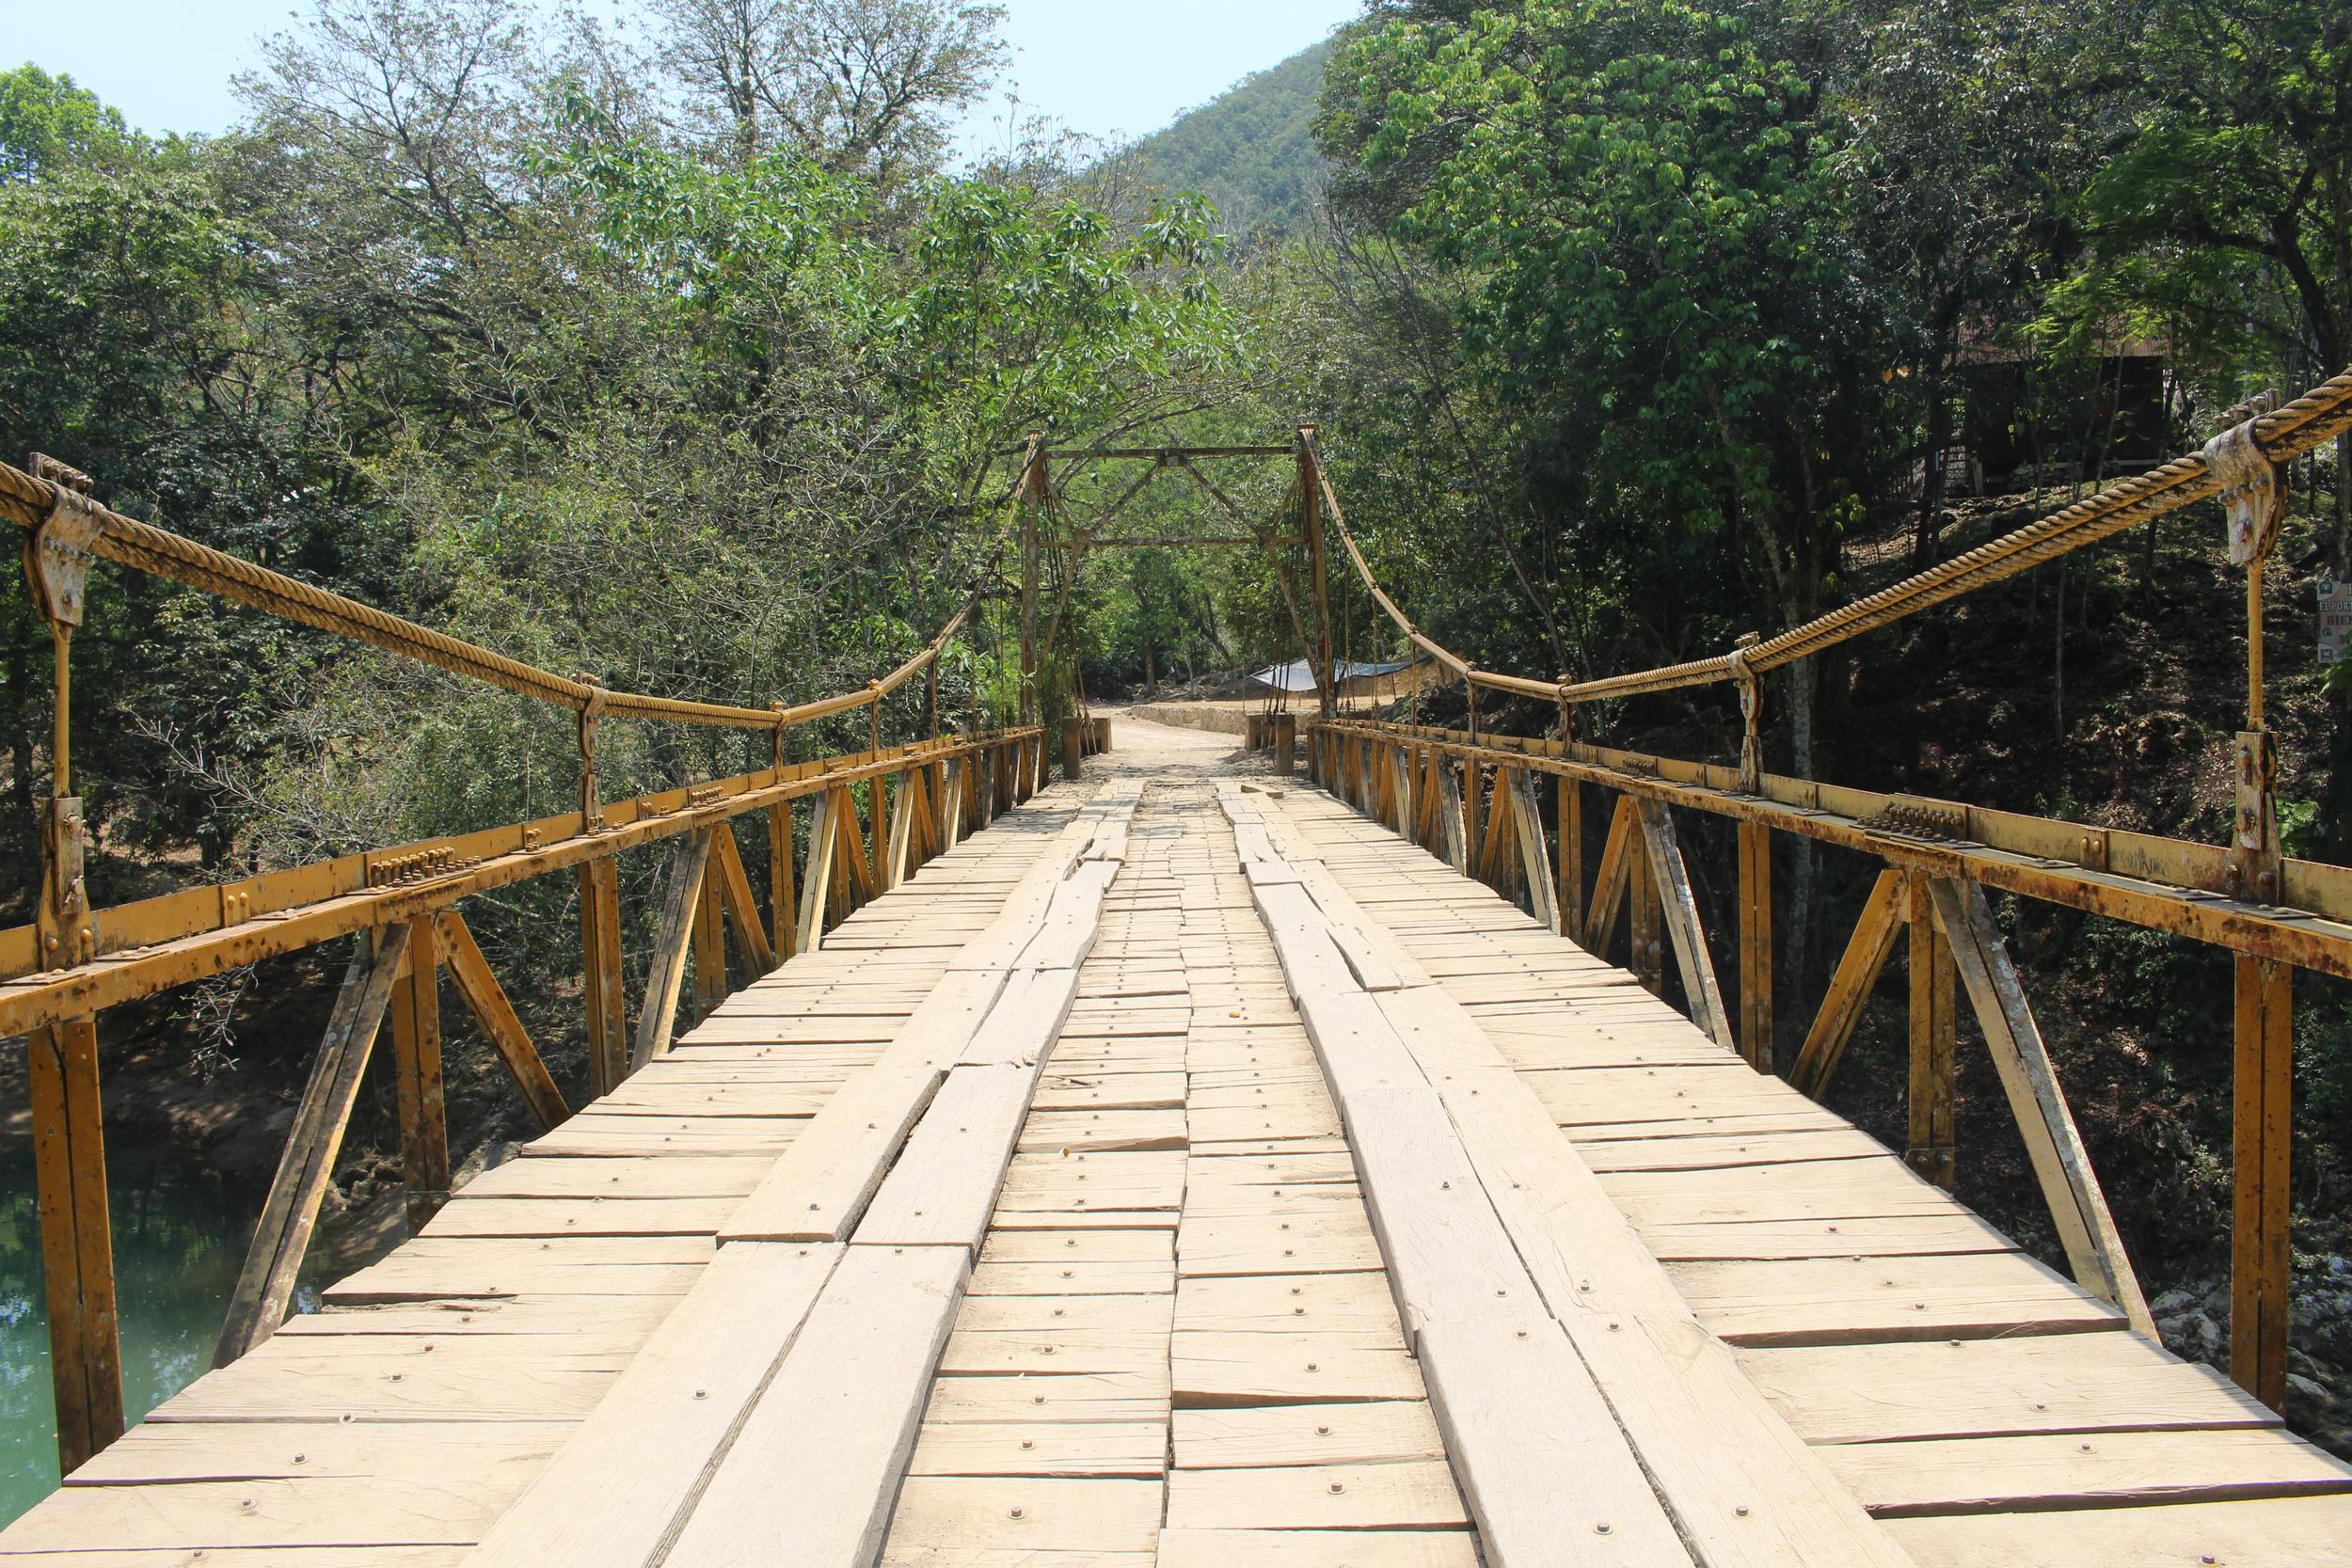 The man-made bridge